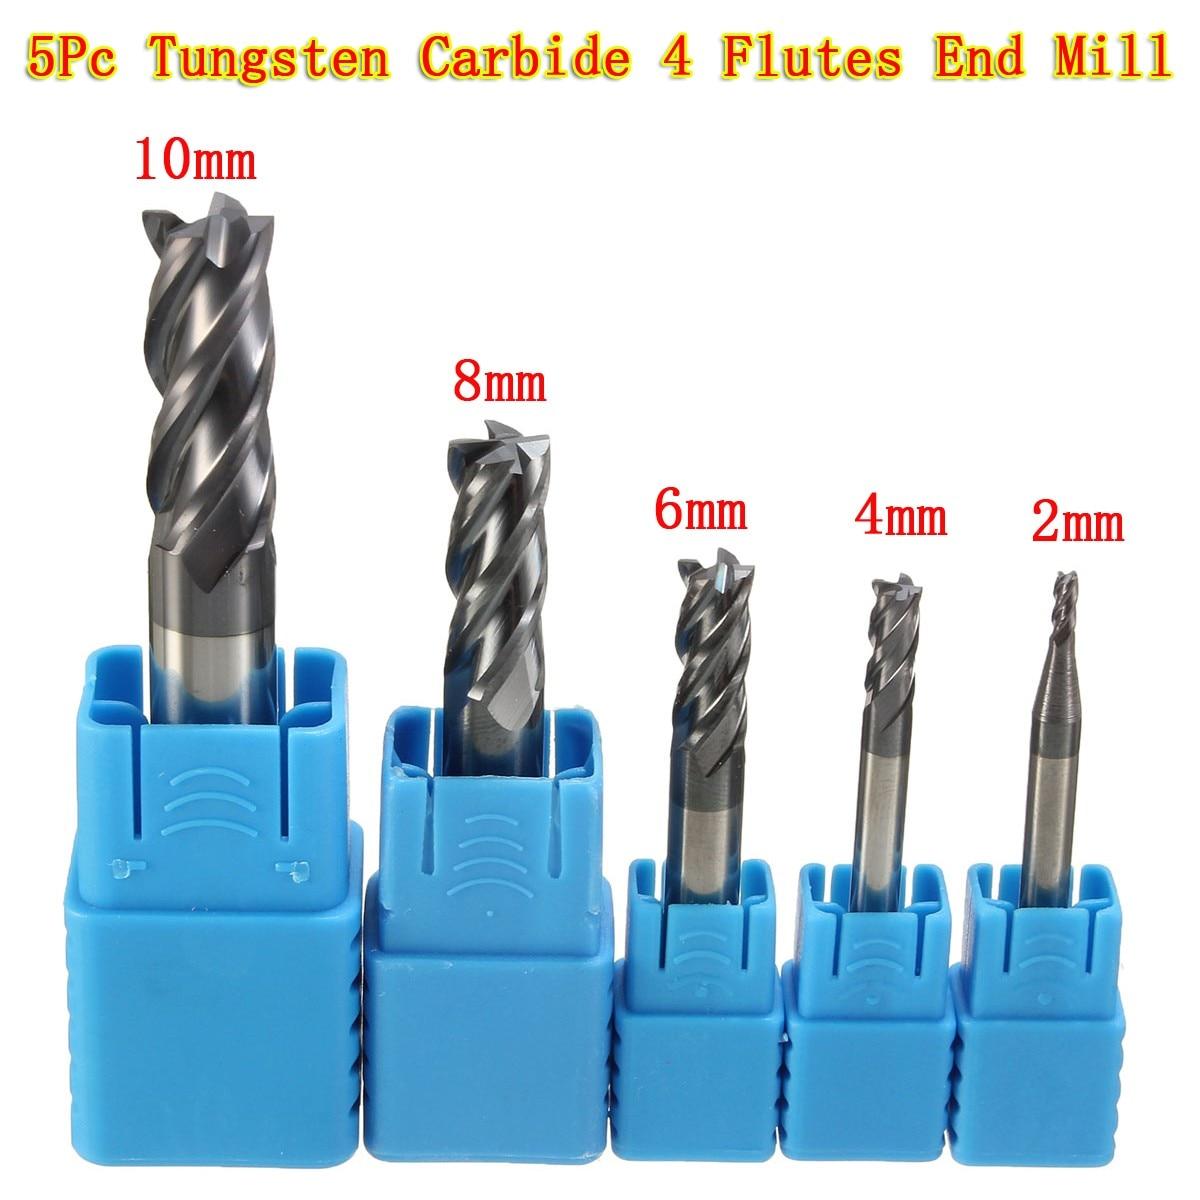 5Pcs Set 2 4 6 8 10MM Tungsten Carbide Straight Shank 4 Flutes Blades End Mill